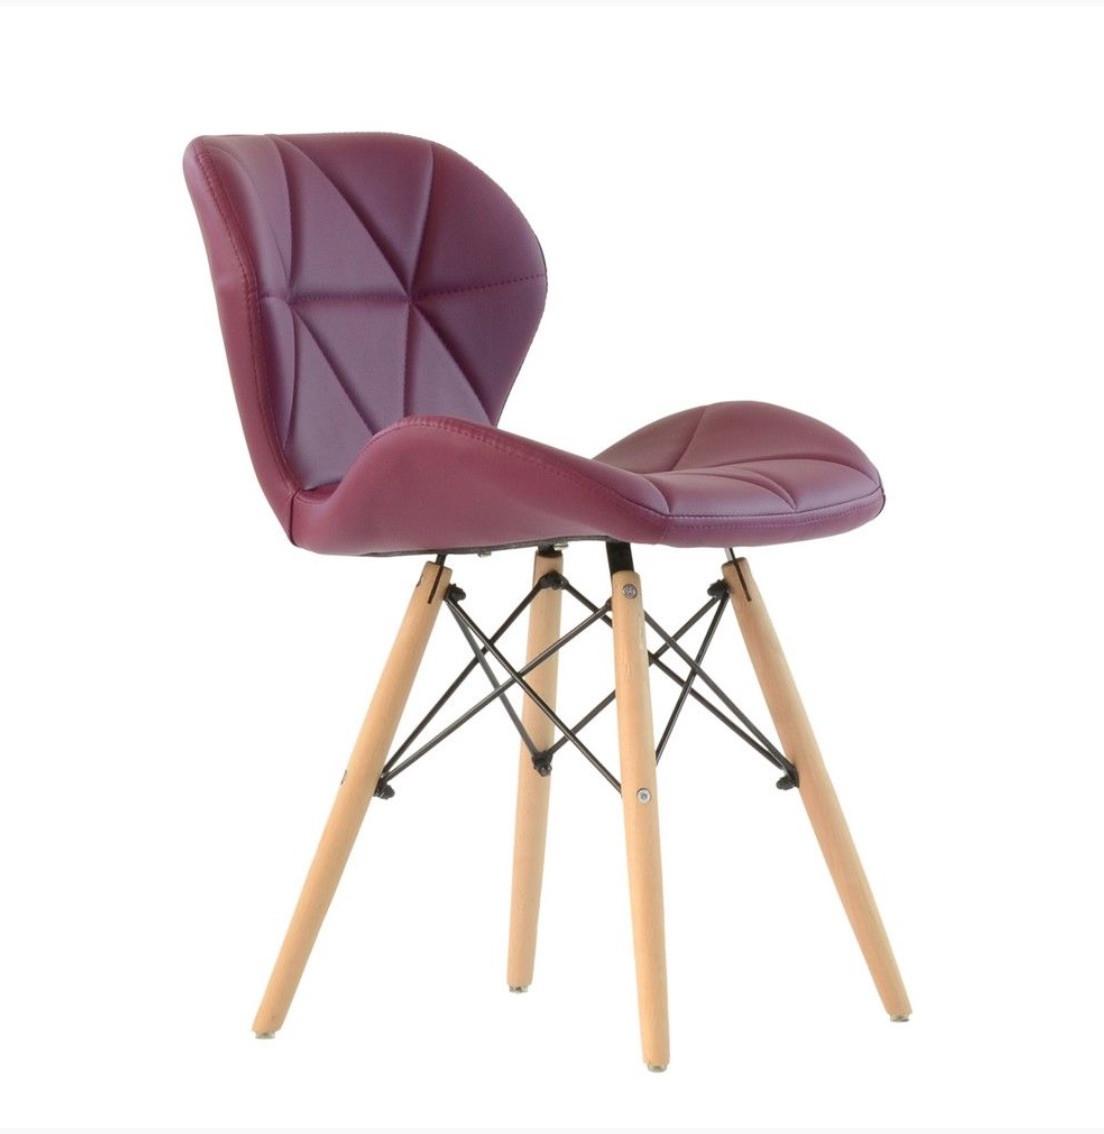 Стул Invar (Инвар)   ЭК экокожа ,цвет пурпурный 61